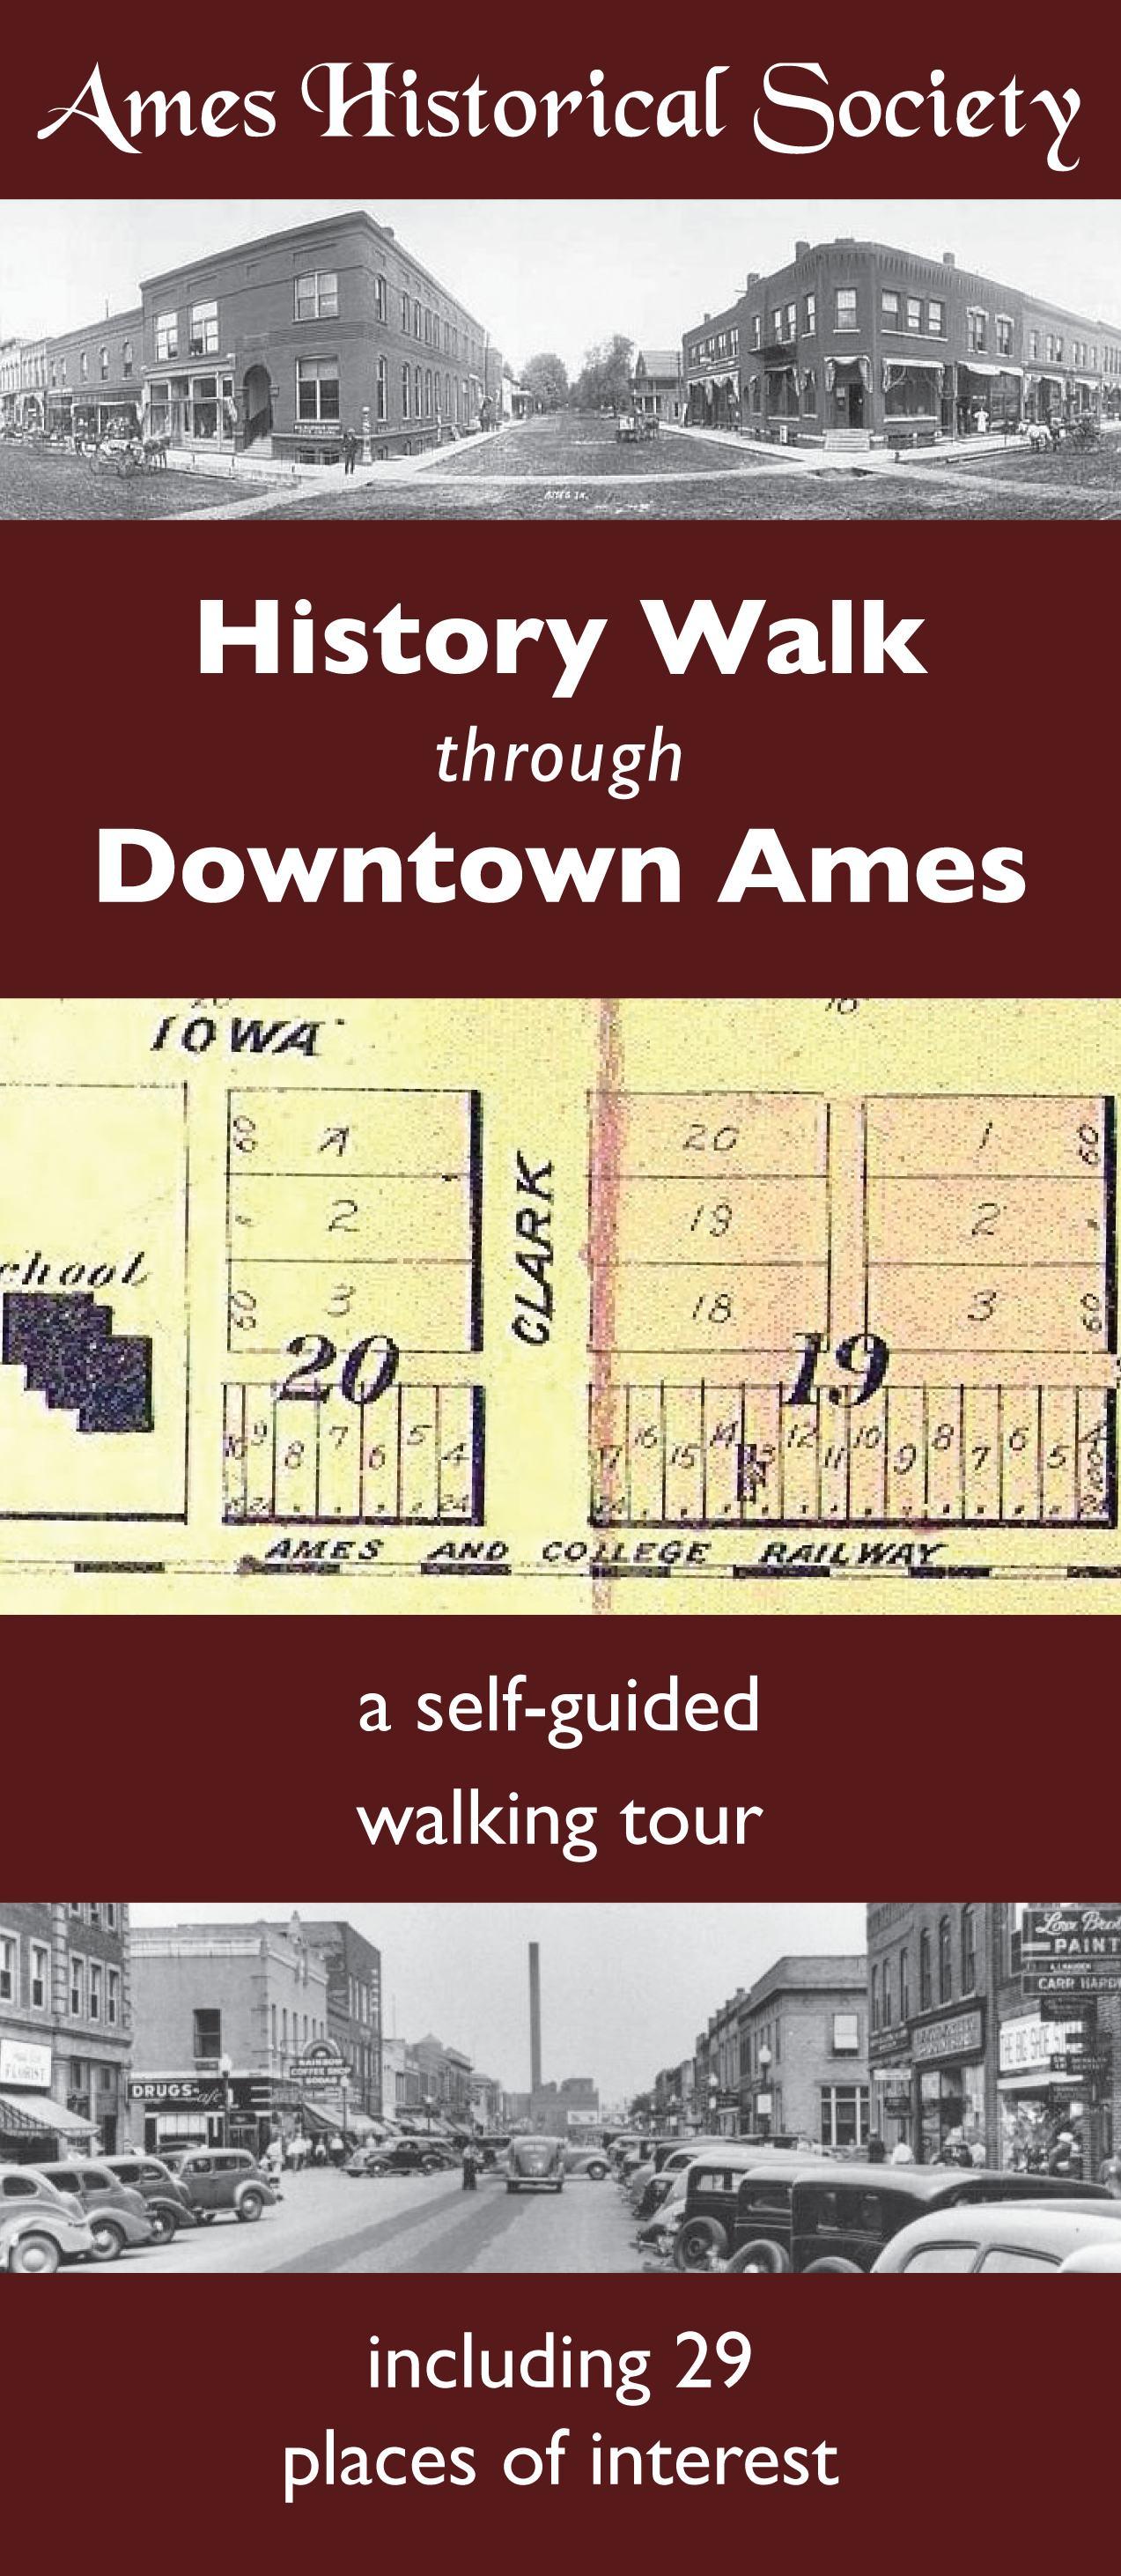 history_walk_through_downtown_ames_cover.jpg